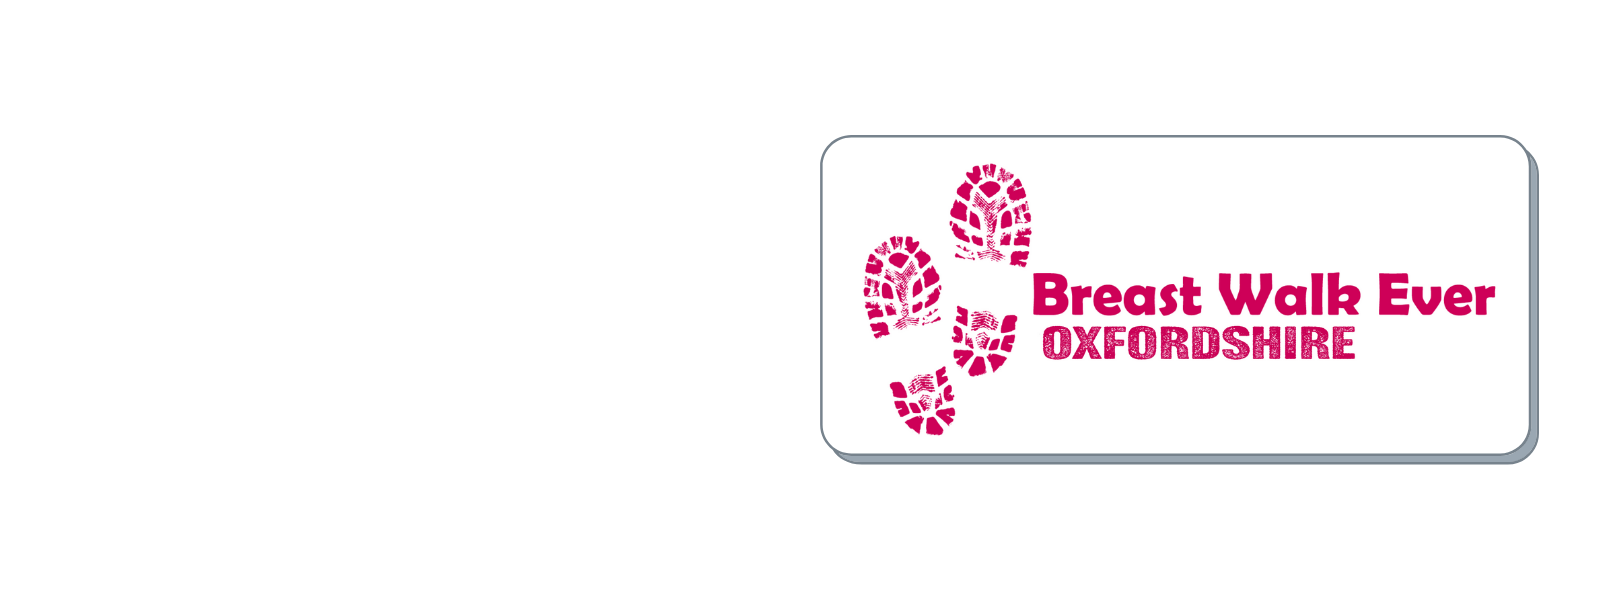 Oxfordshire Button